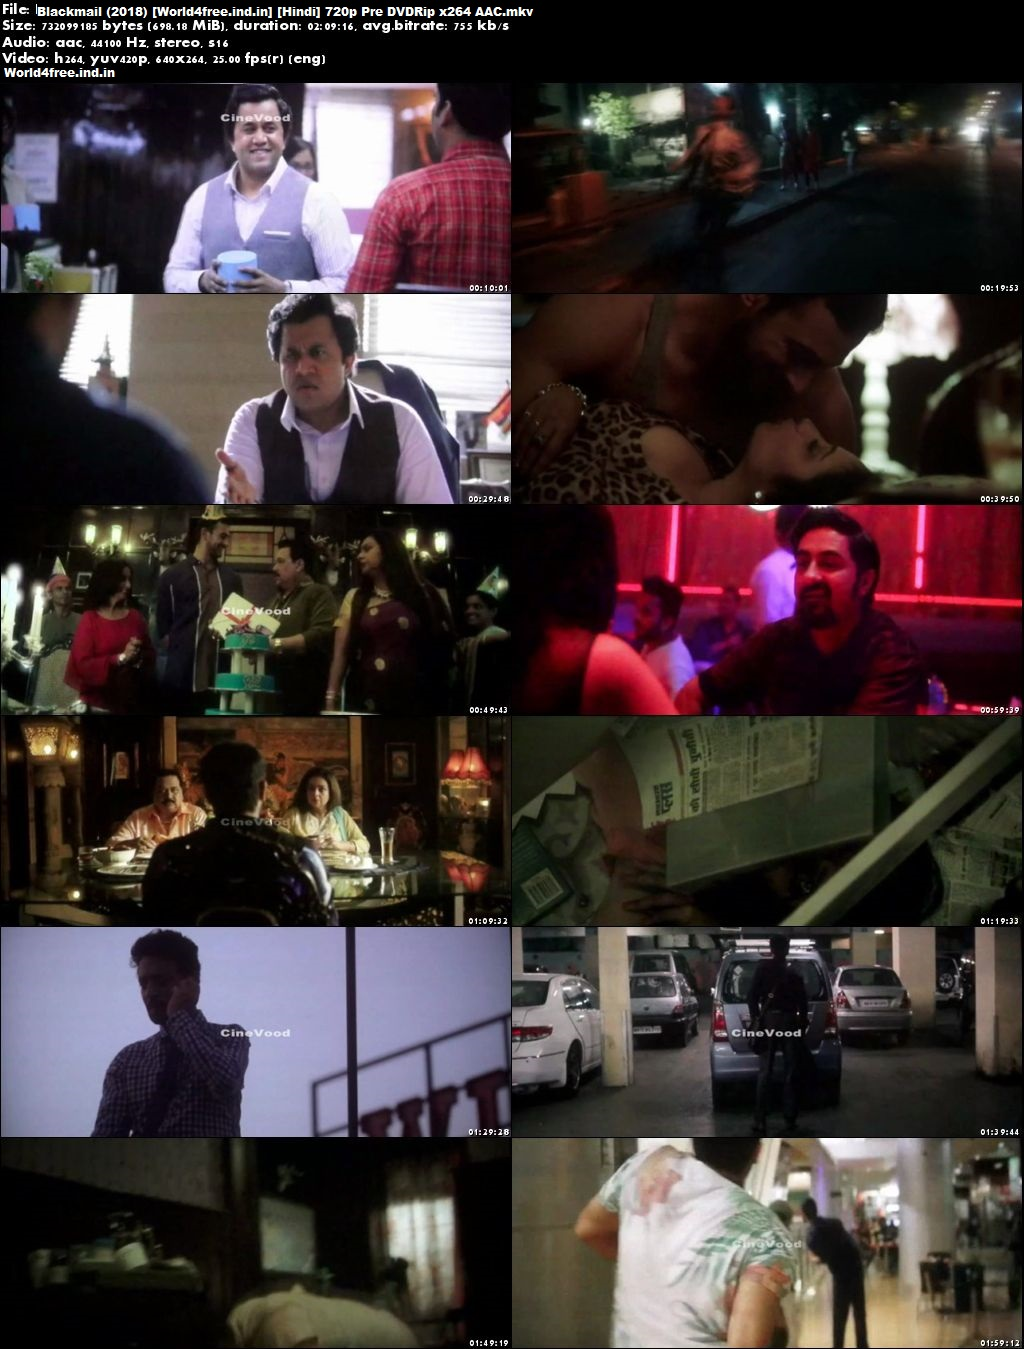 Blackmail 2018 worldfree4u Hindi Movie Hd Download pDVDRip